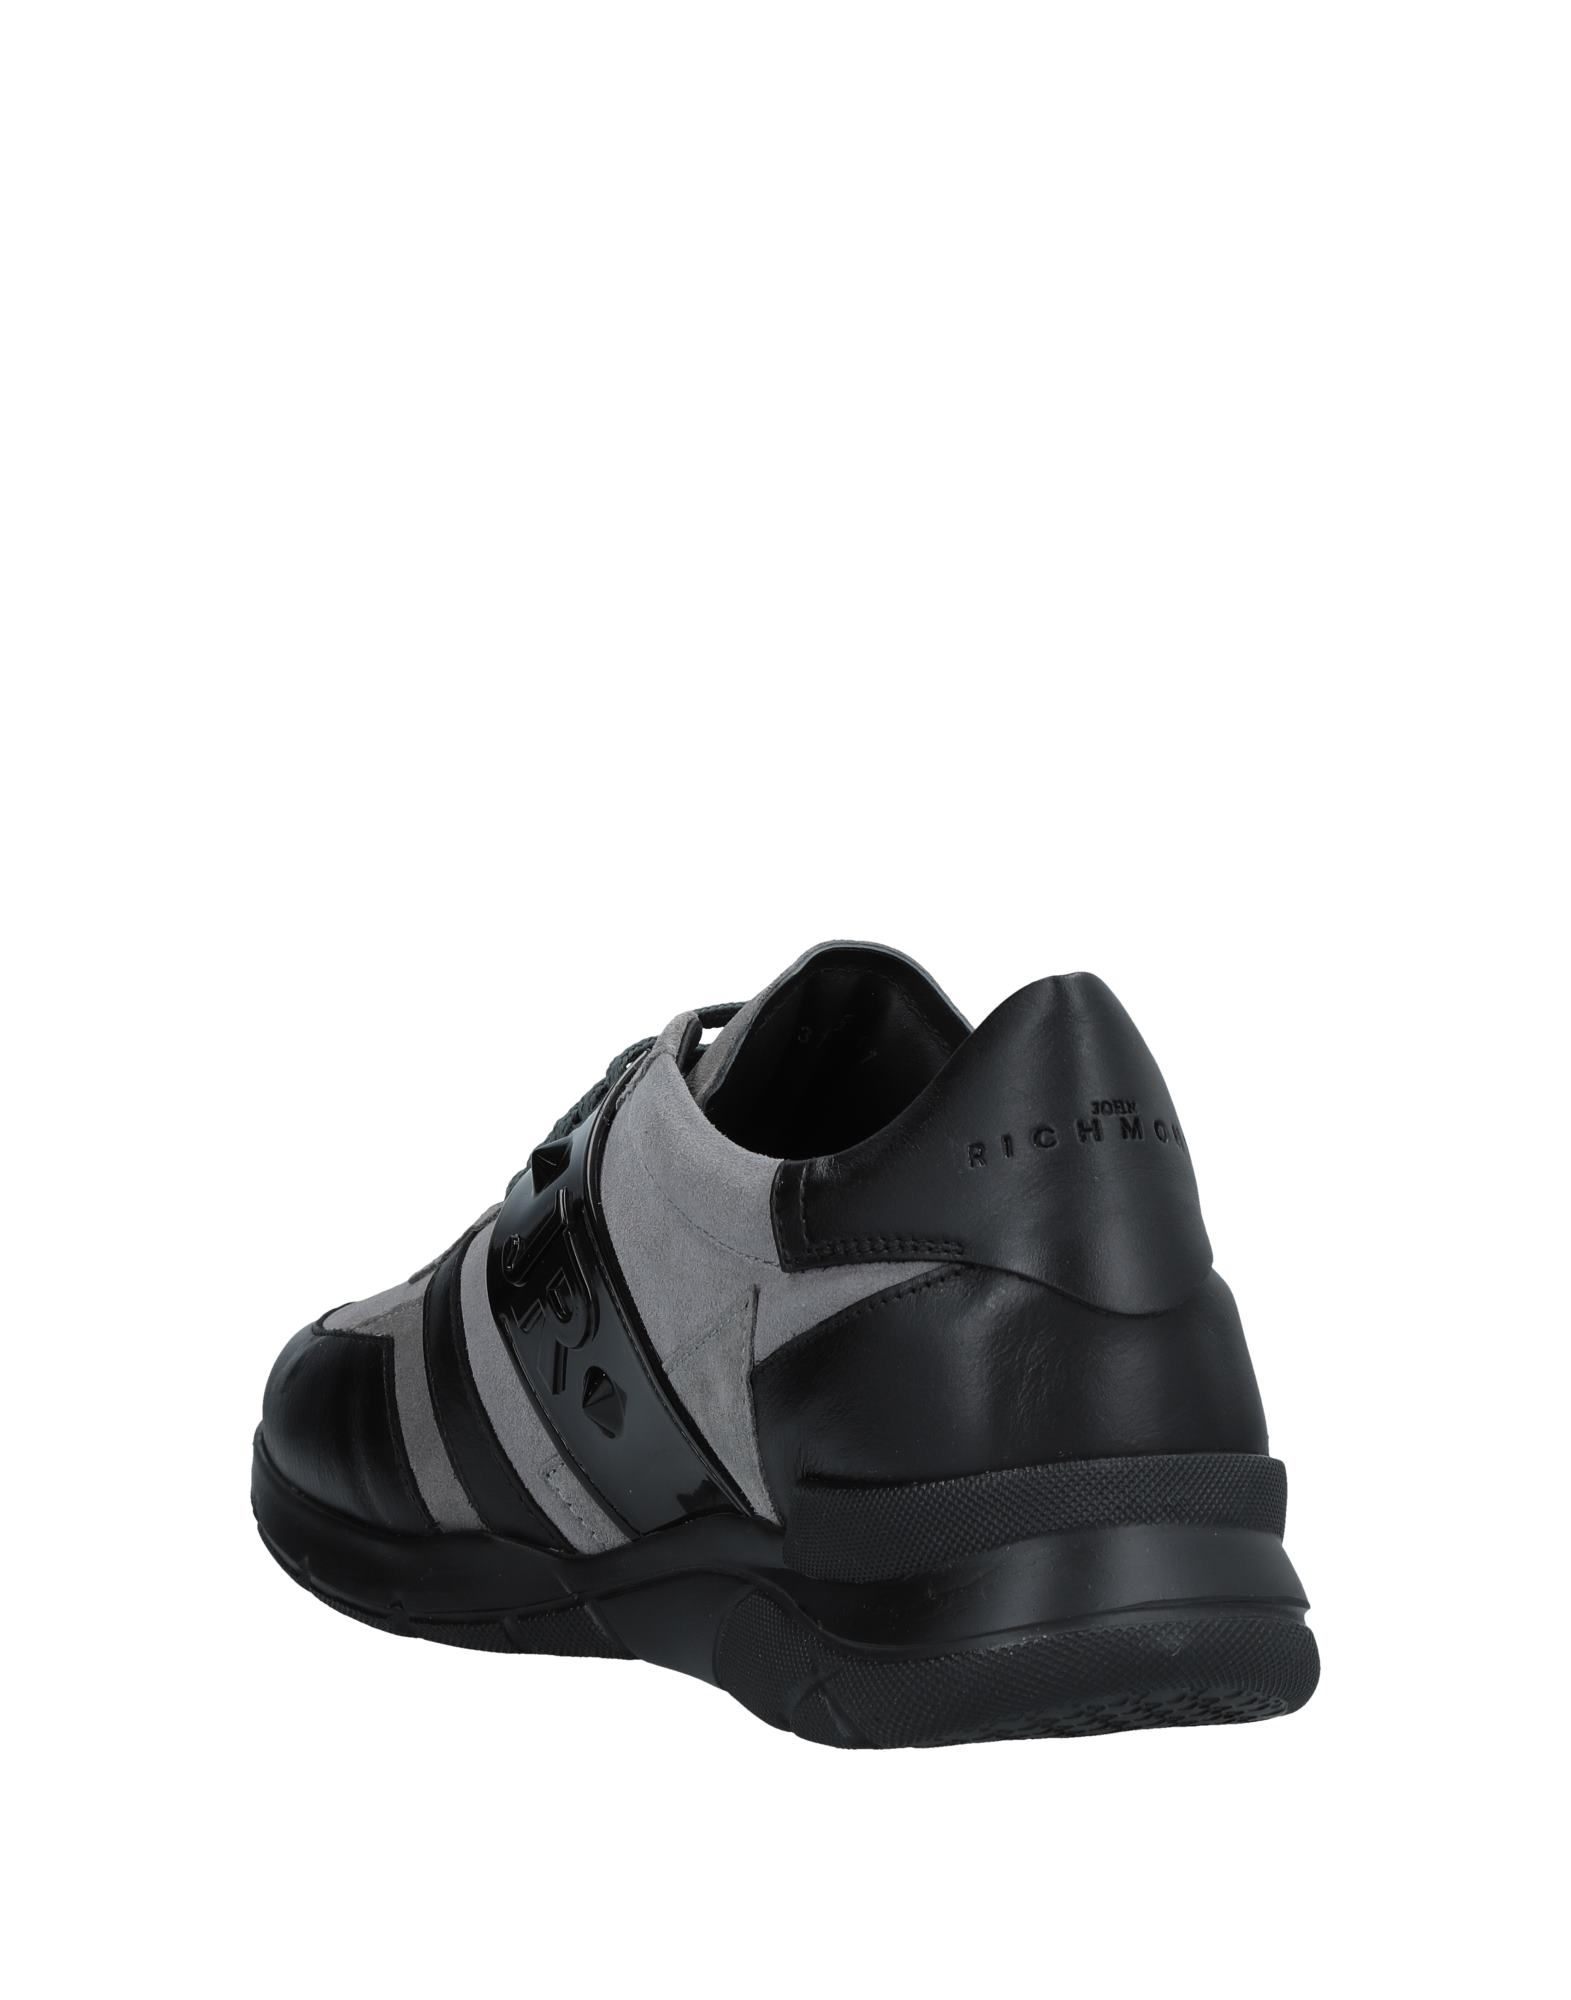 John Richmond Sneakers Herren  11538099QA